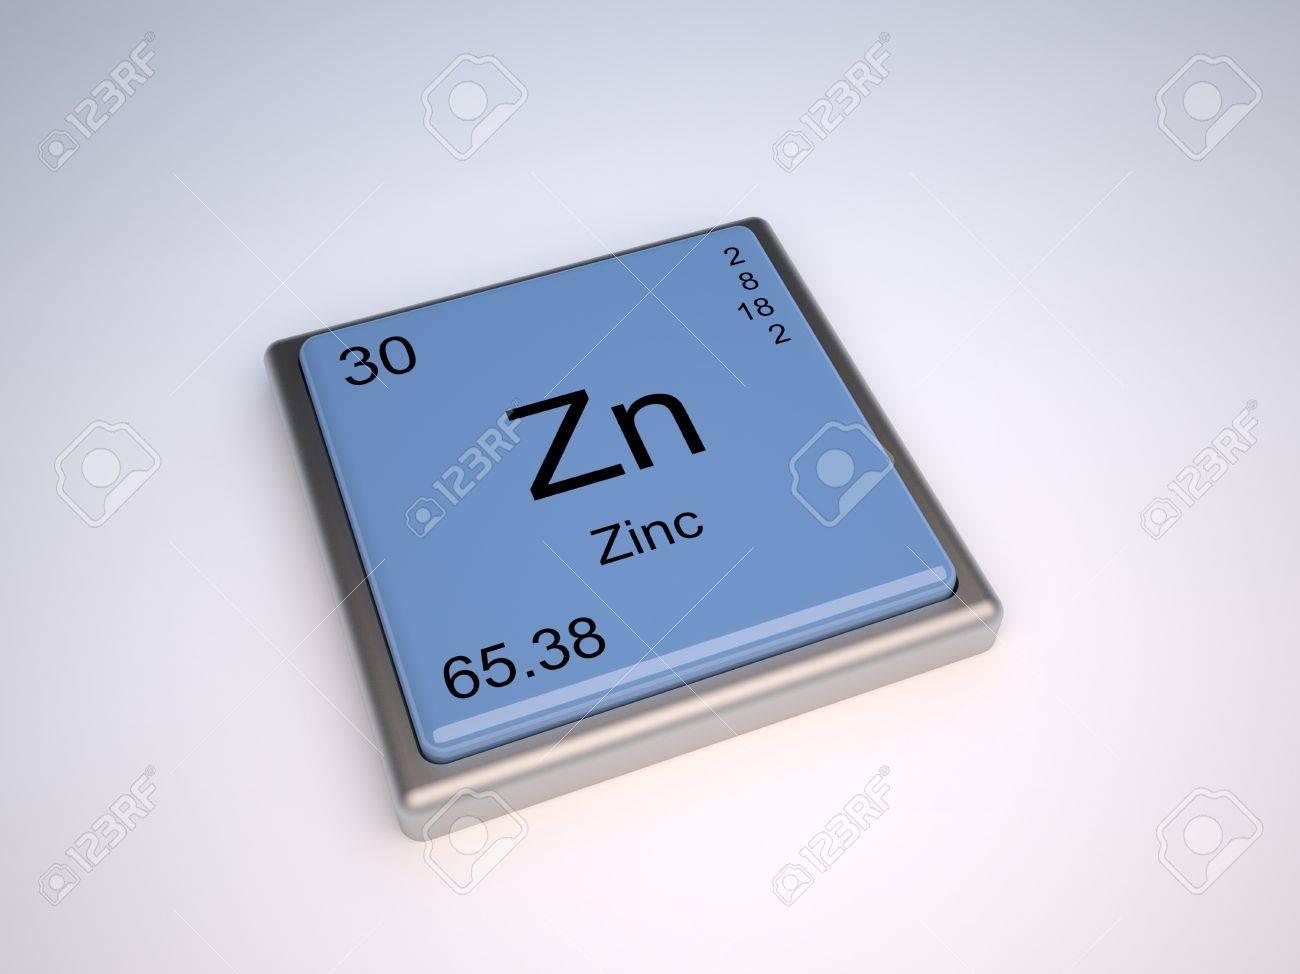 Elemento qumico de cinc de la tabla peridica con smbolo zn fotos elemento qumico de cinc de la tabla peridica con smbolo zn foto de archivo 9257130 urtaz Images